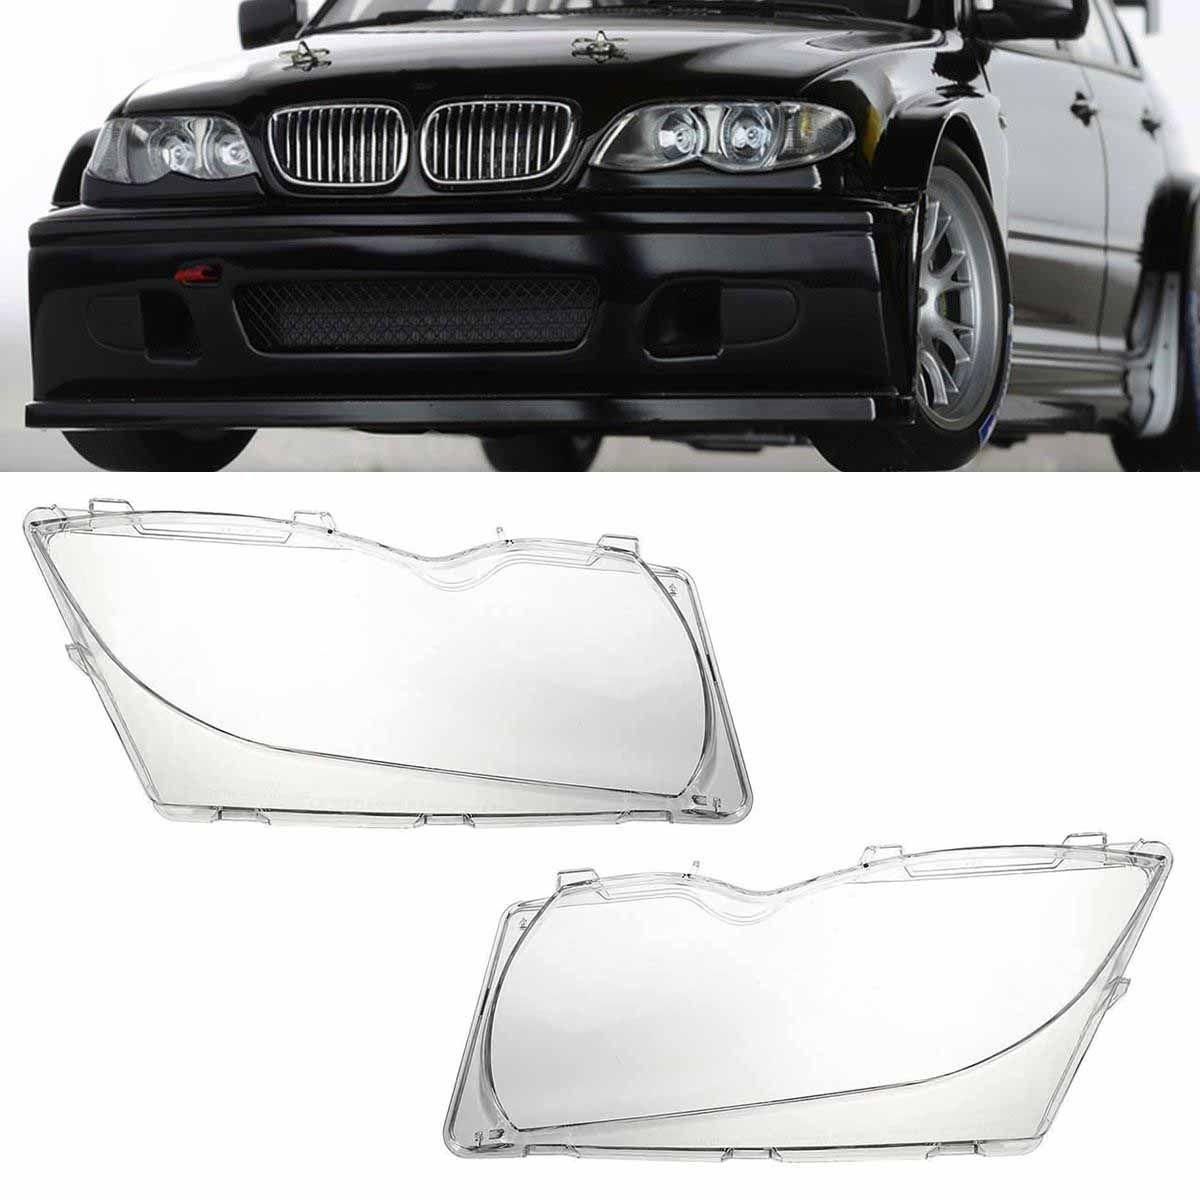 Mayitr 1 Pair Front Car Headlight Lens Plastic Shell Cover for BMW E46 3-series 4DR 320i 325i 325xi 330i 330xi 2001-2005